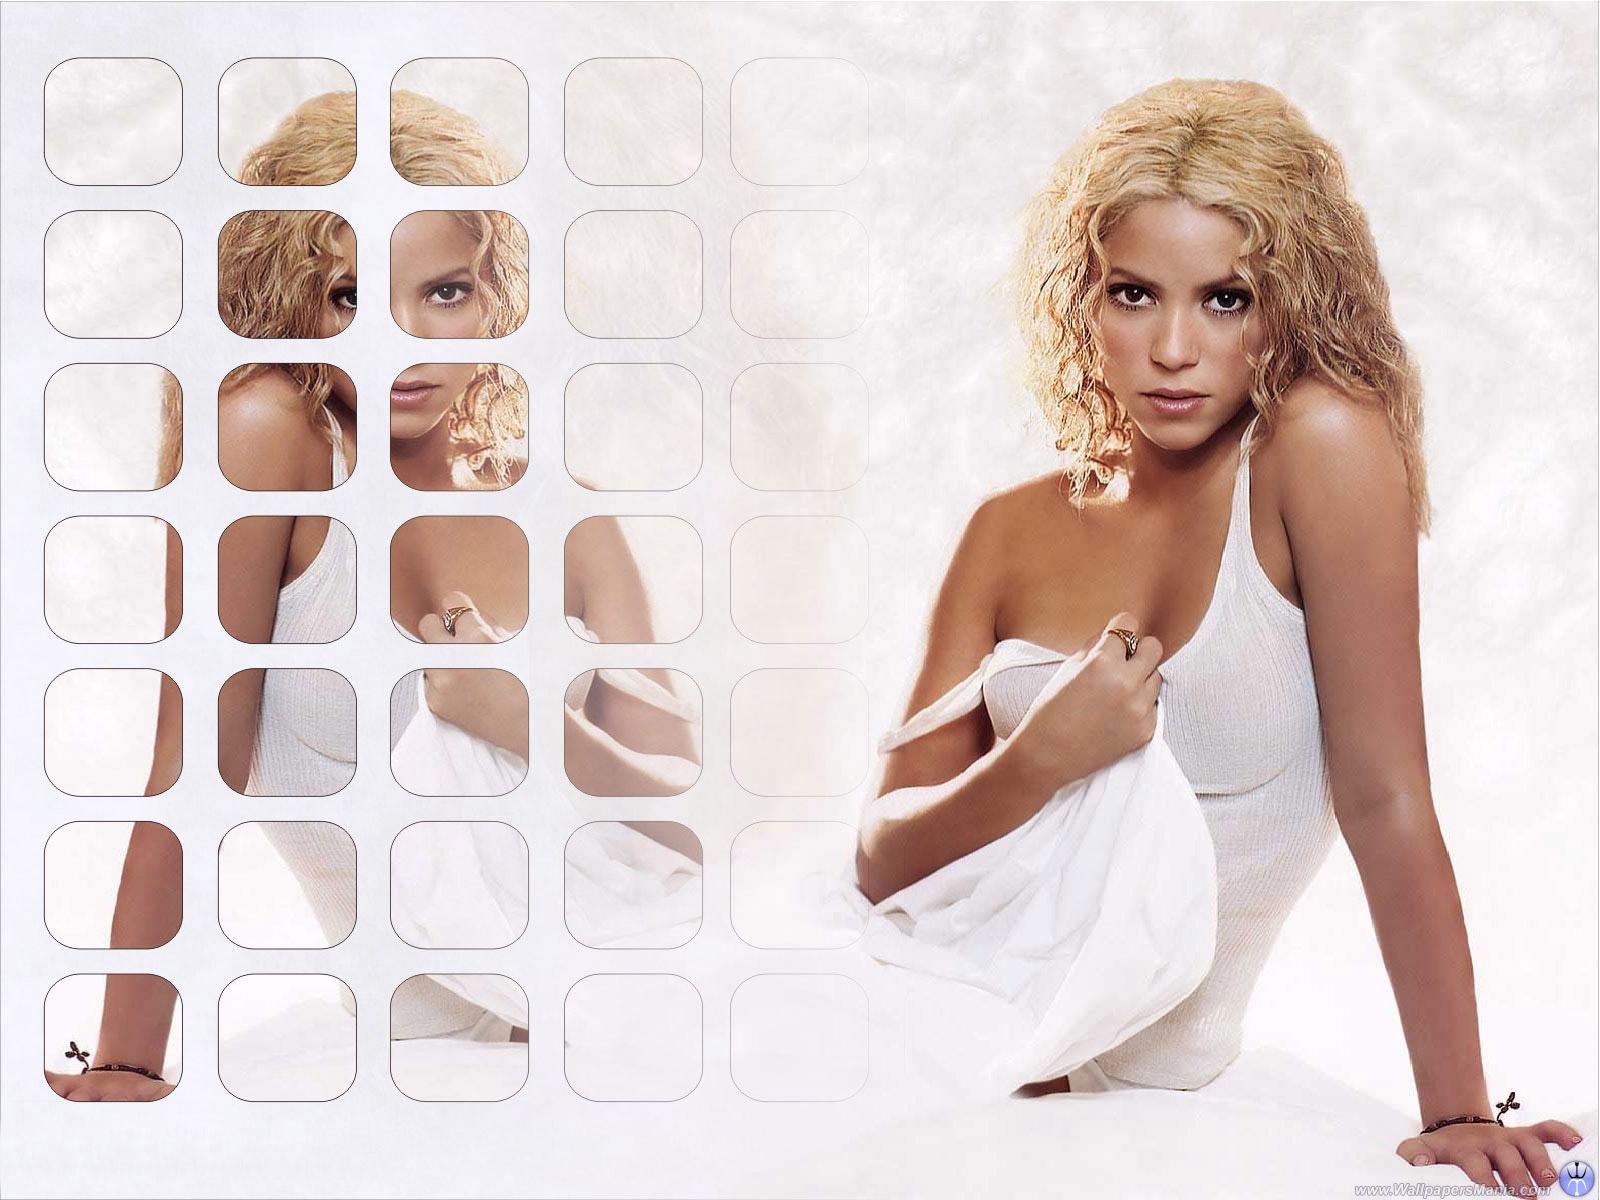 High Resolution Wallpaper Shakira Hd Wallpapers-4460